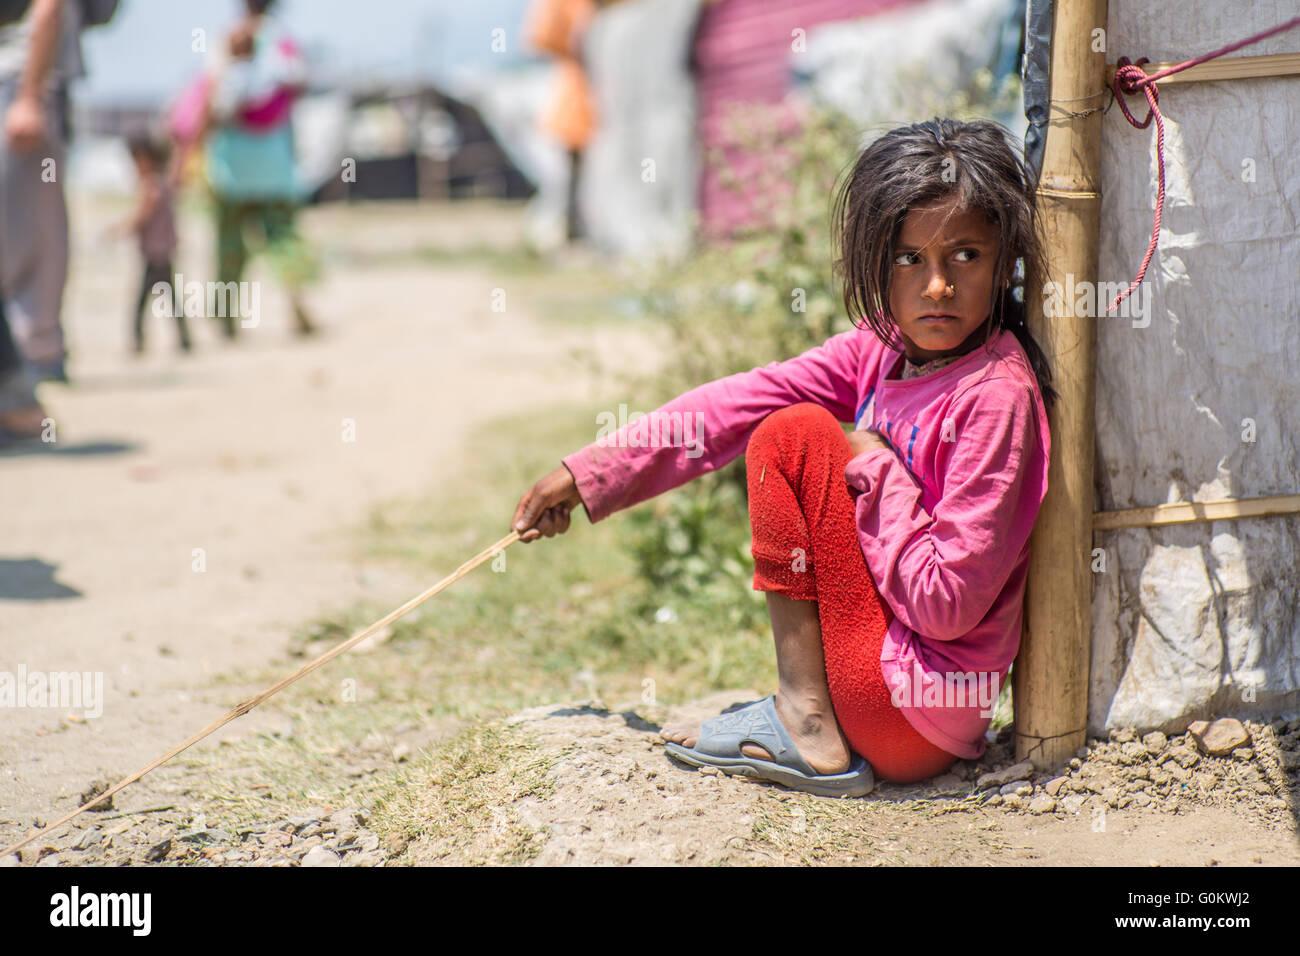 Obdachlos Mit Kind